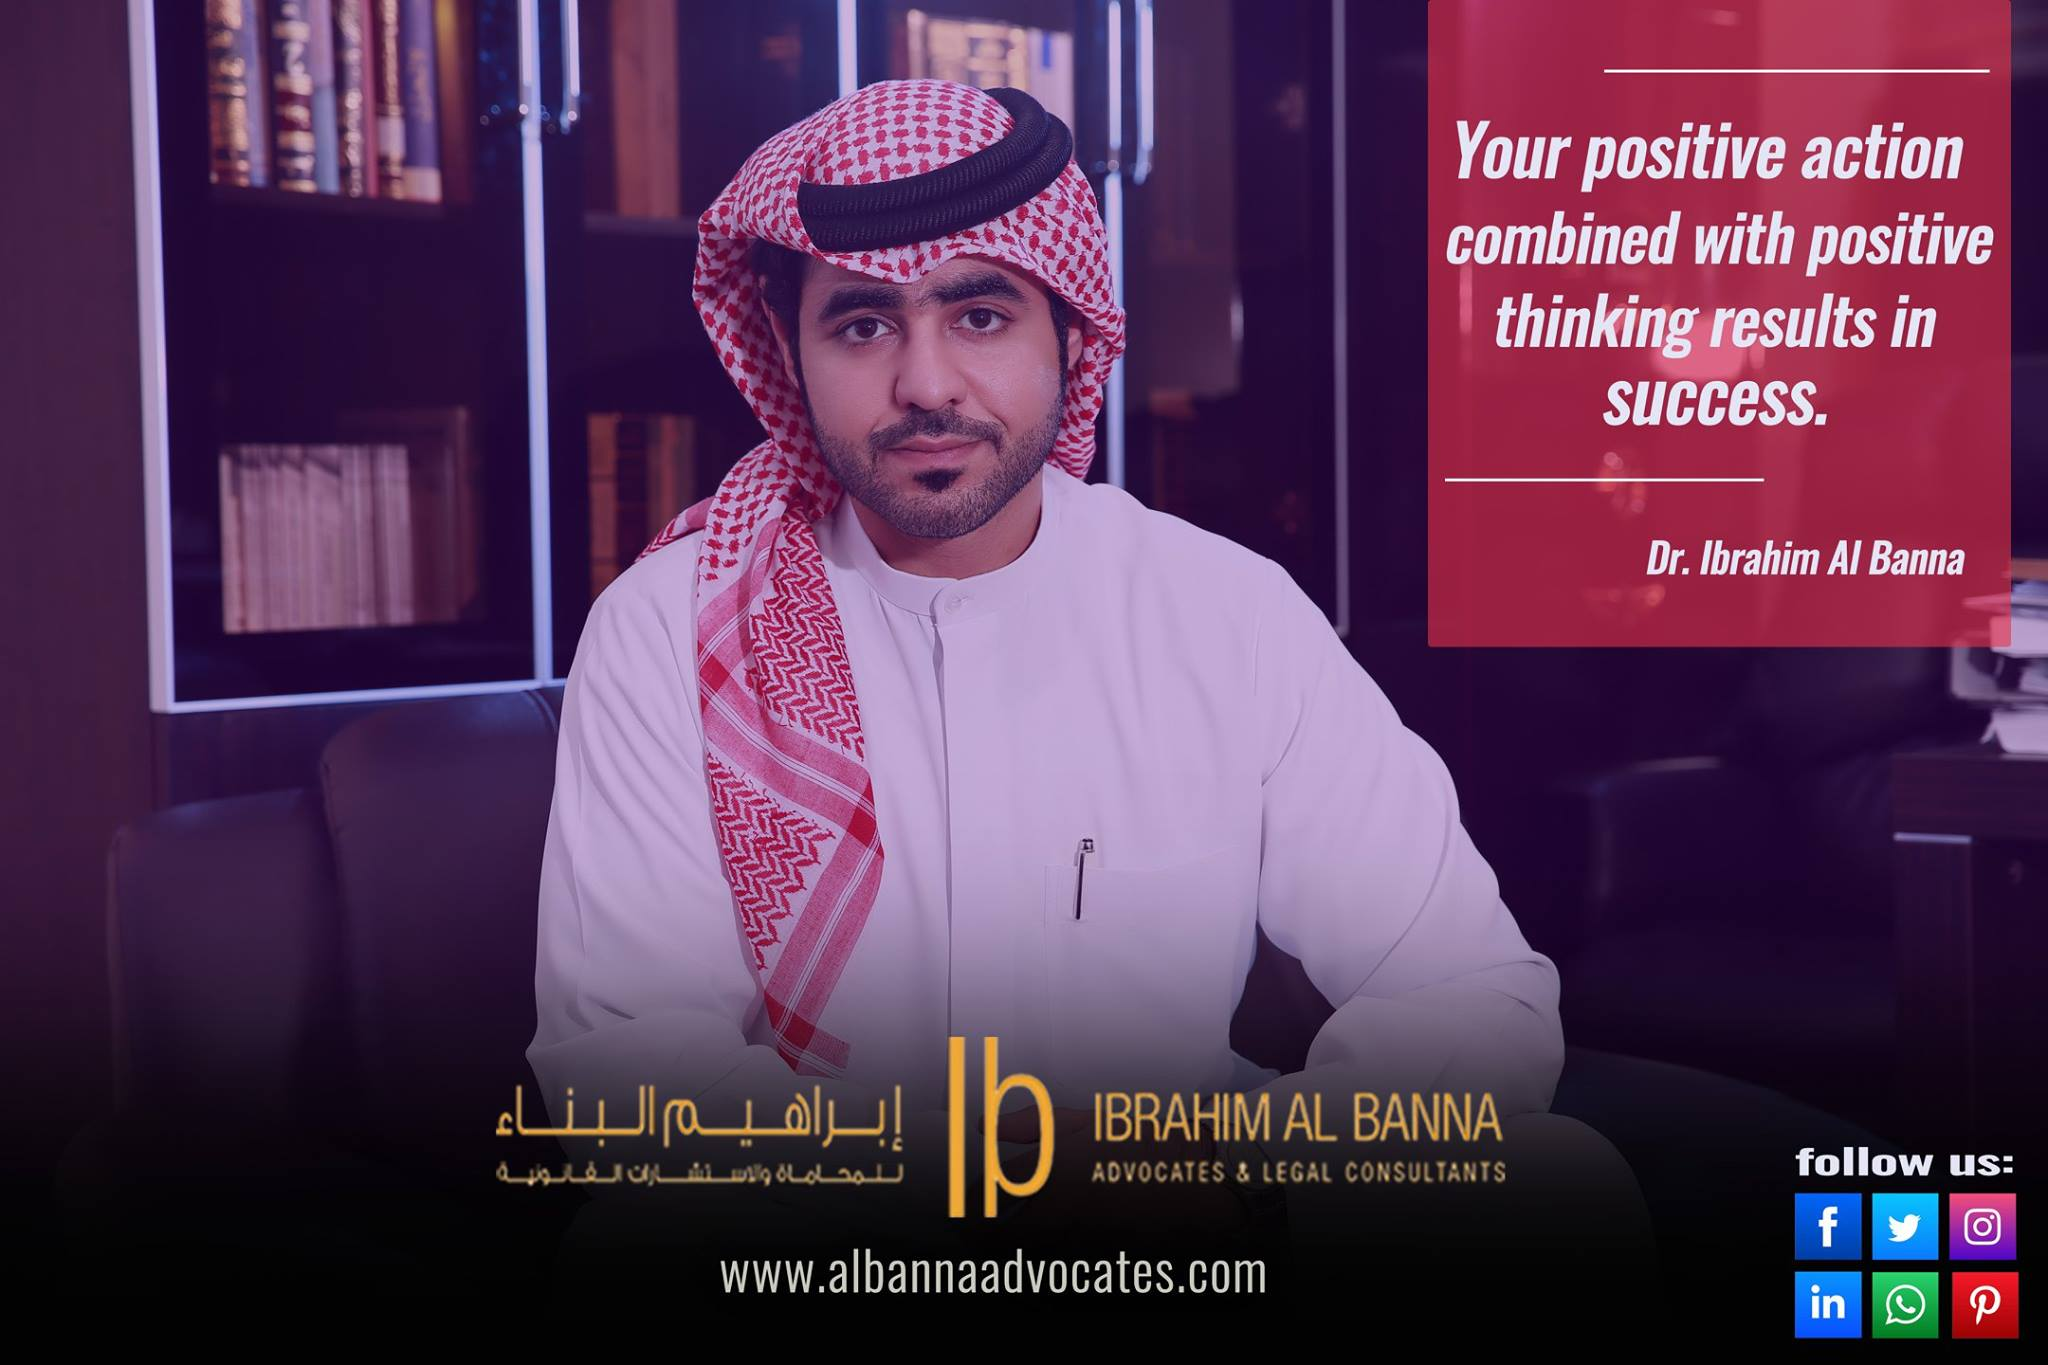 Ibrahim Al Banna Advocates & Legal Consultants.jpg